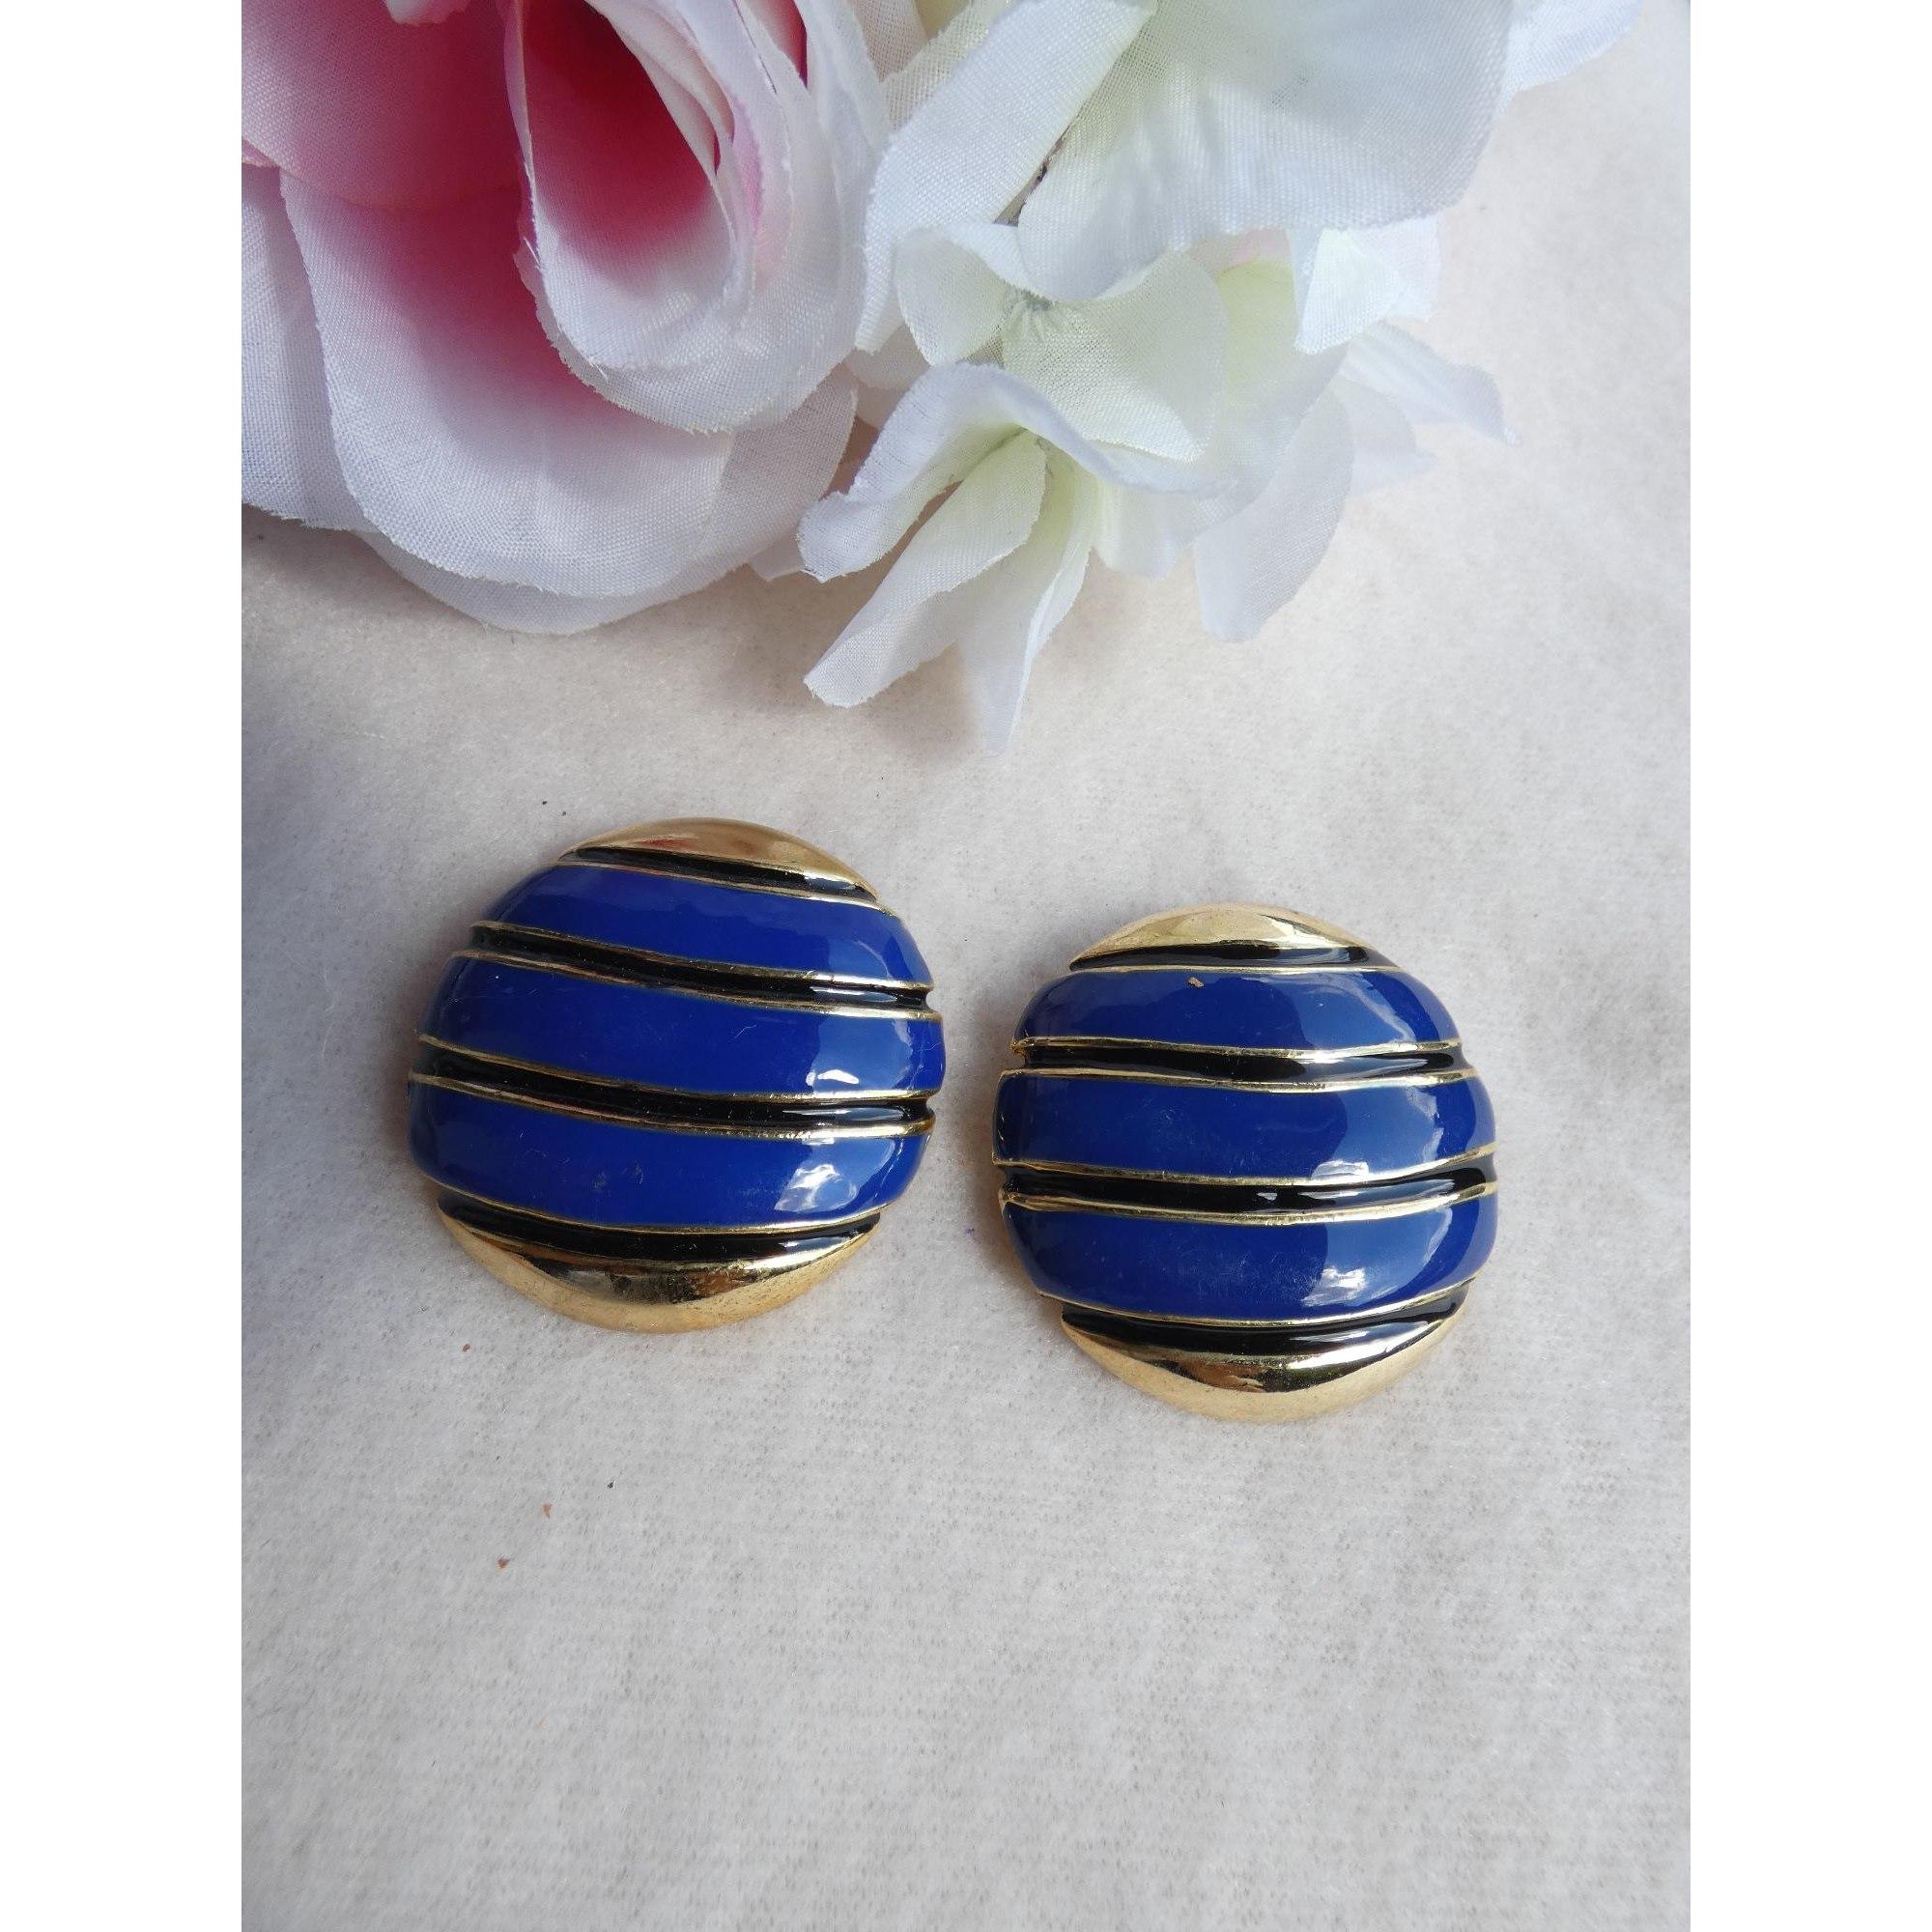 Boucles d'oreille 100% VINTAGE Bleu, bleu marine, bleu turquoise